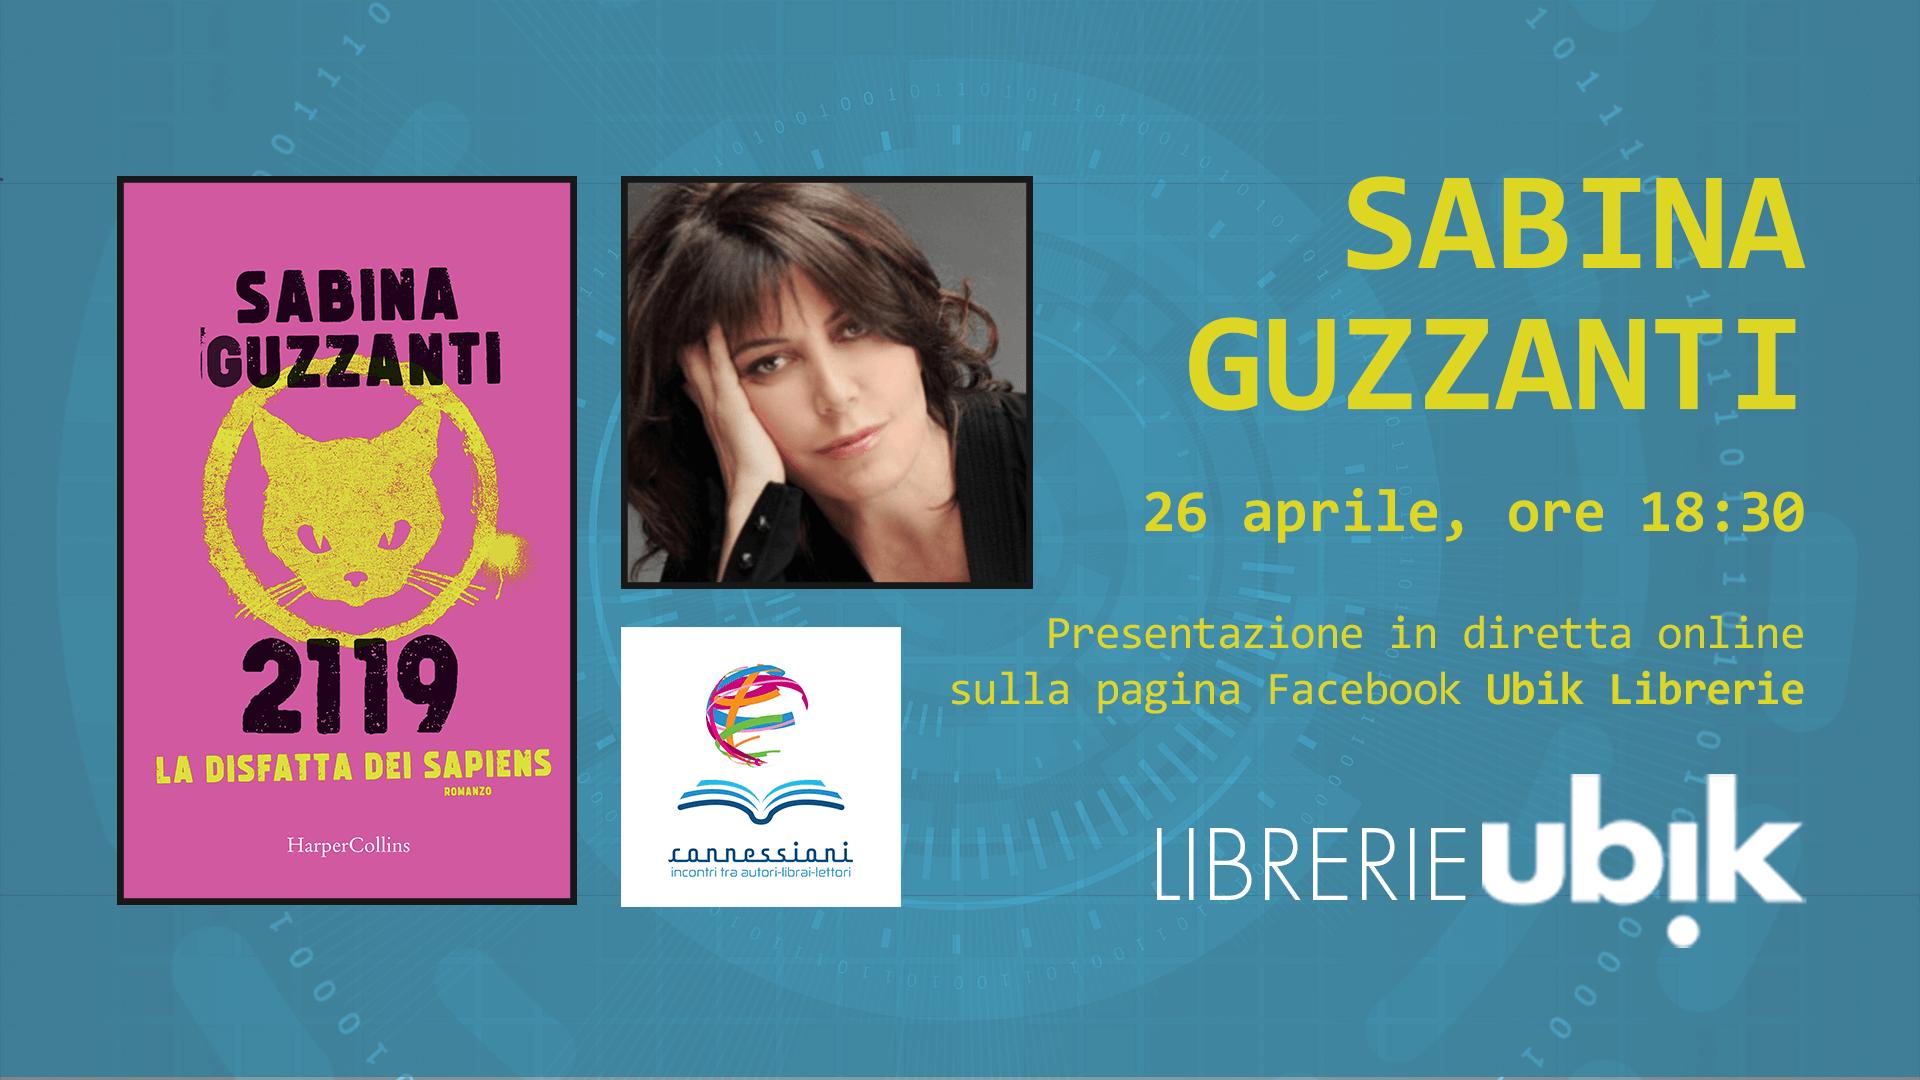 SABINA GUZZANTI presenta in diretta online